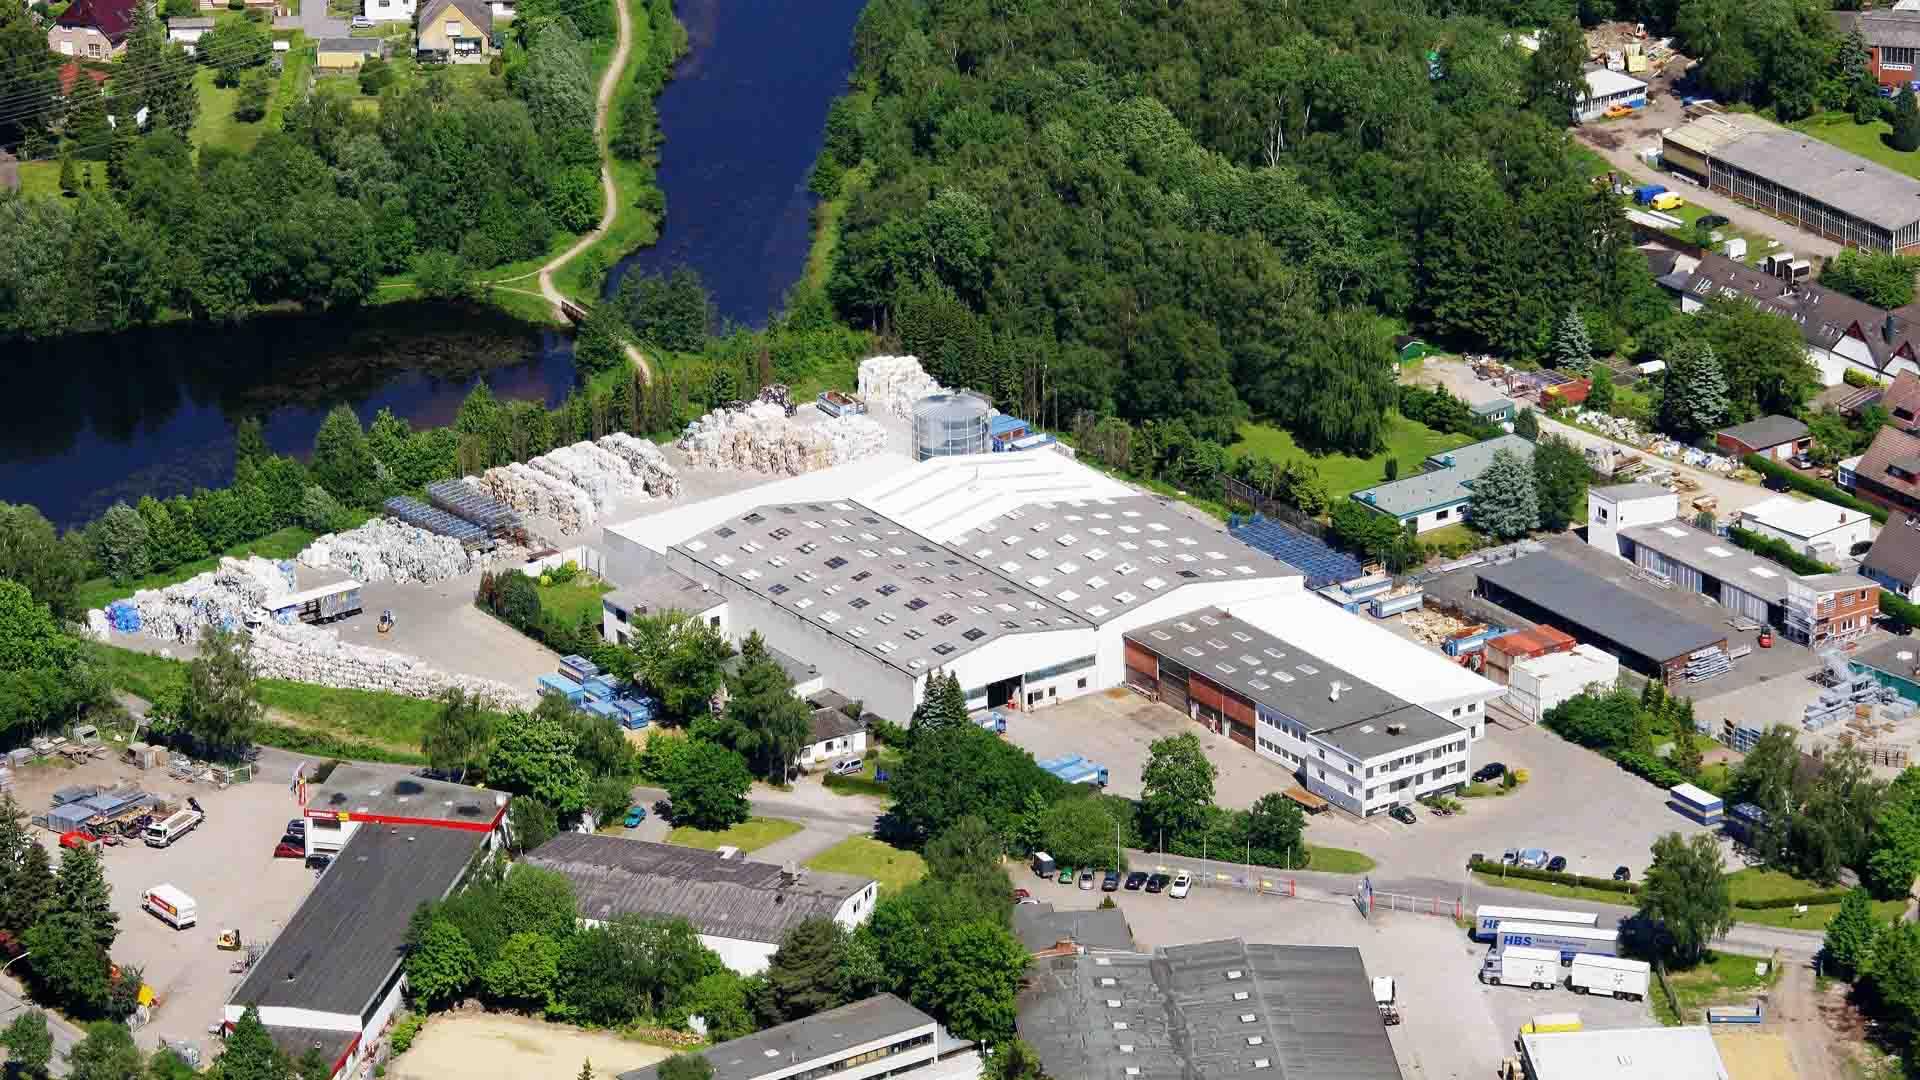 Daberkow-Recycling-Entsorgungsfachbetrieb-Hamburg-Luftaufnahme